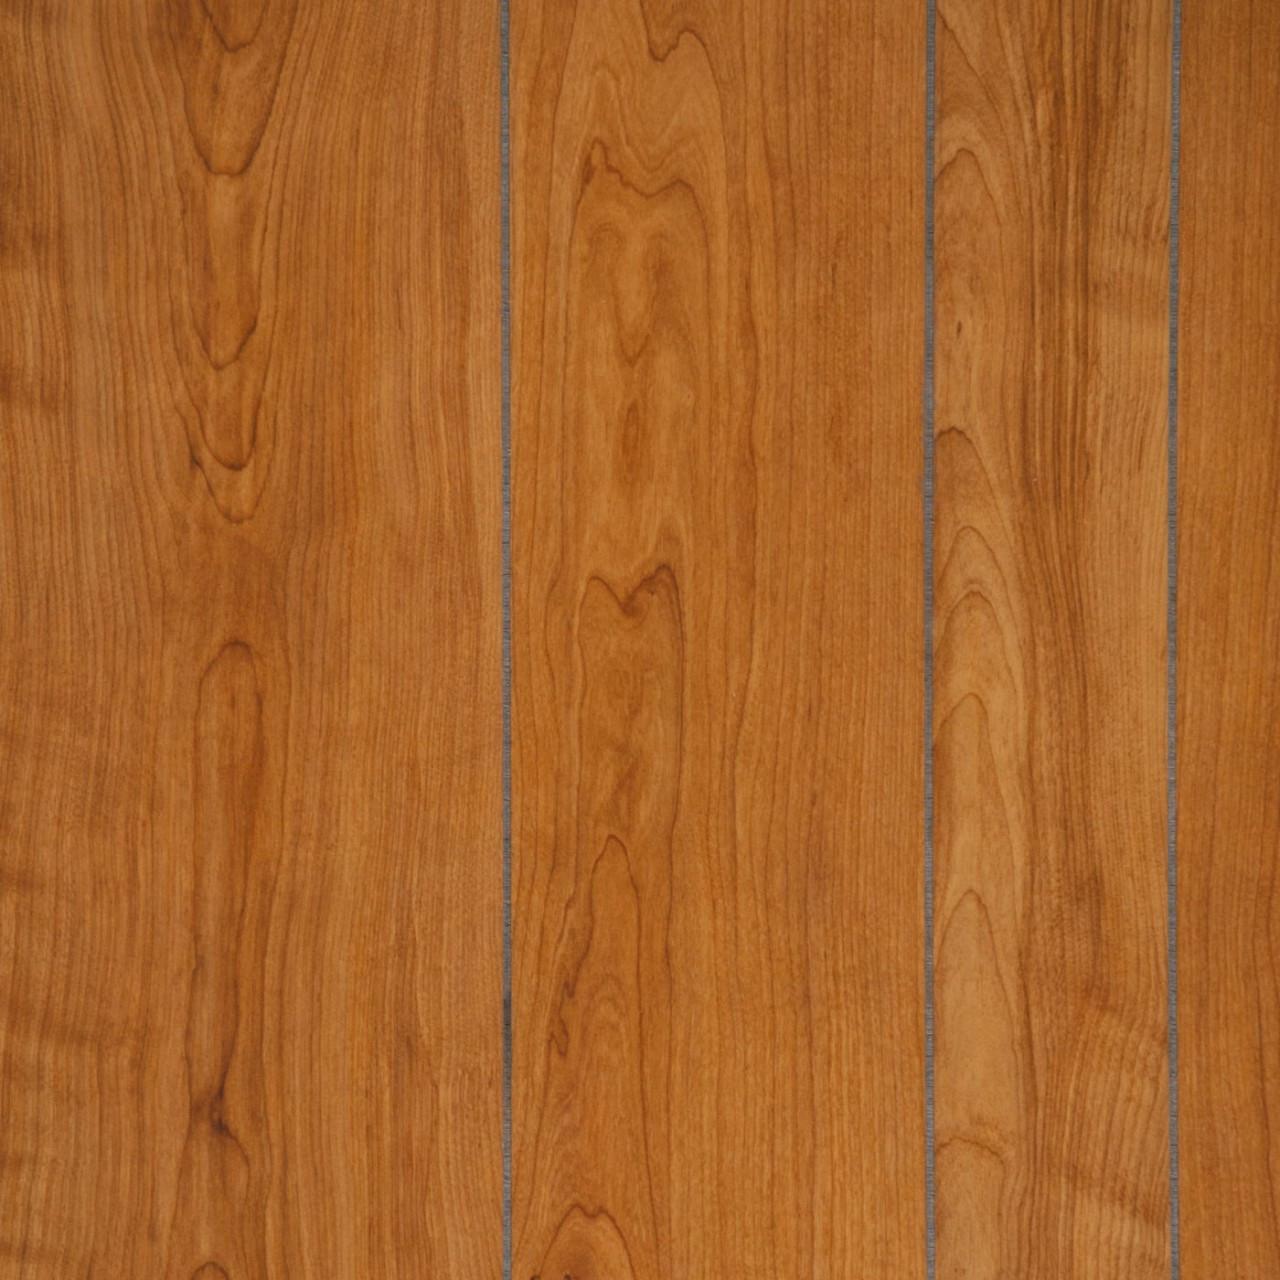 wood paneling williamsburg cherry random plank panels